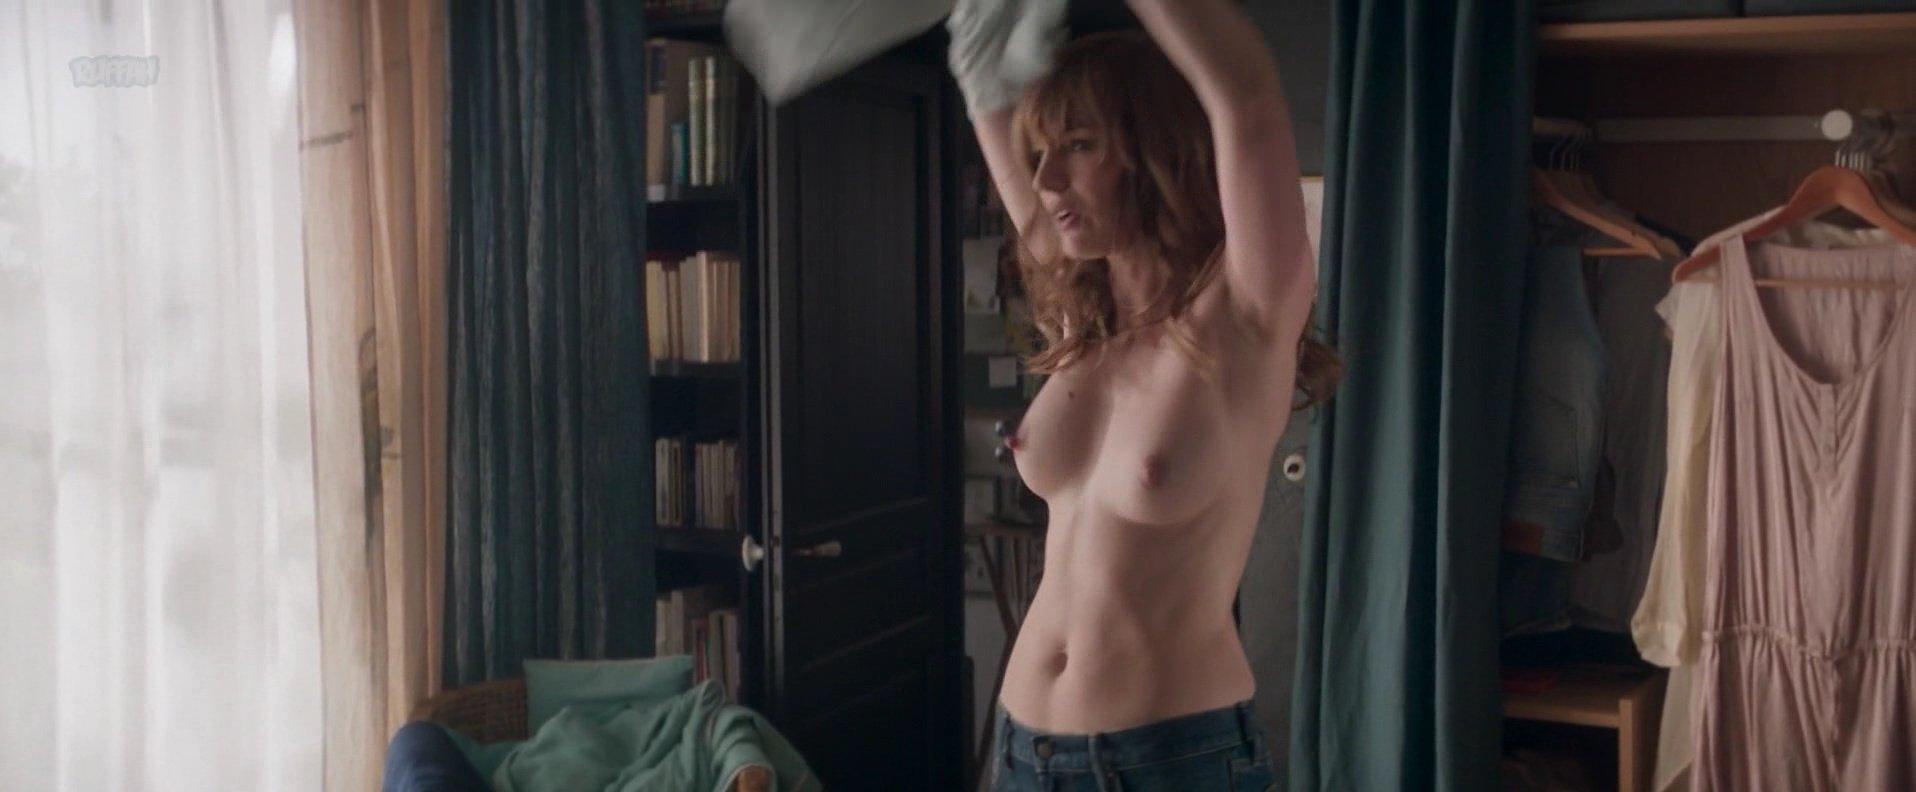 dans nude videos